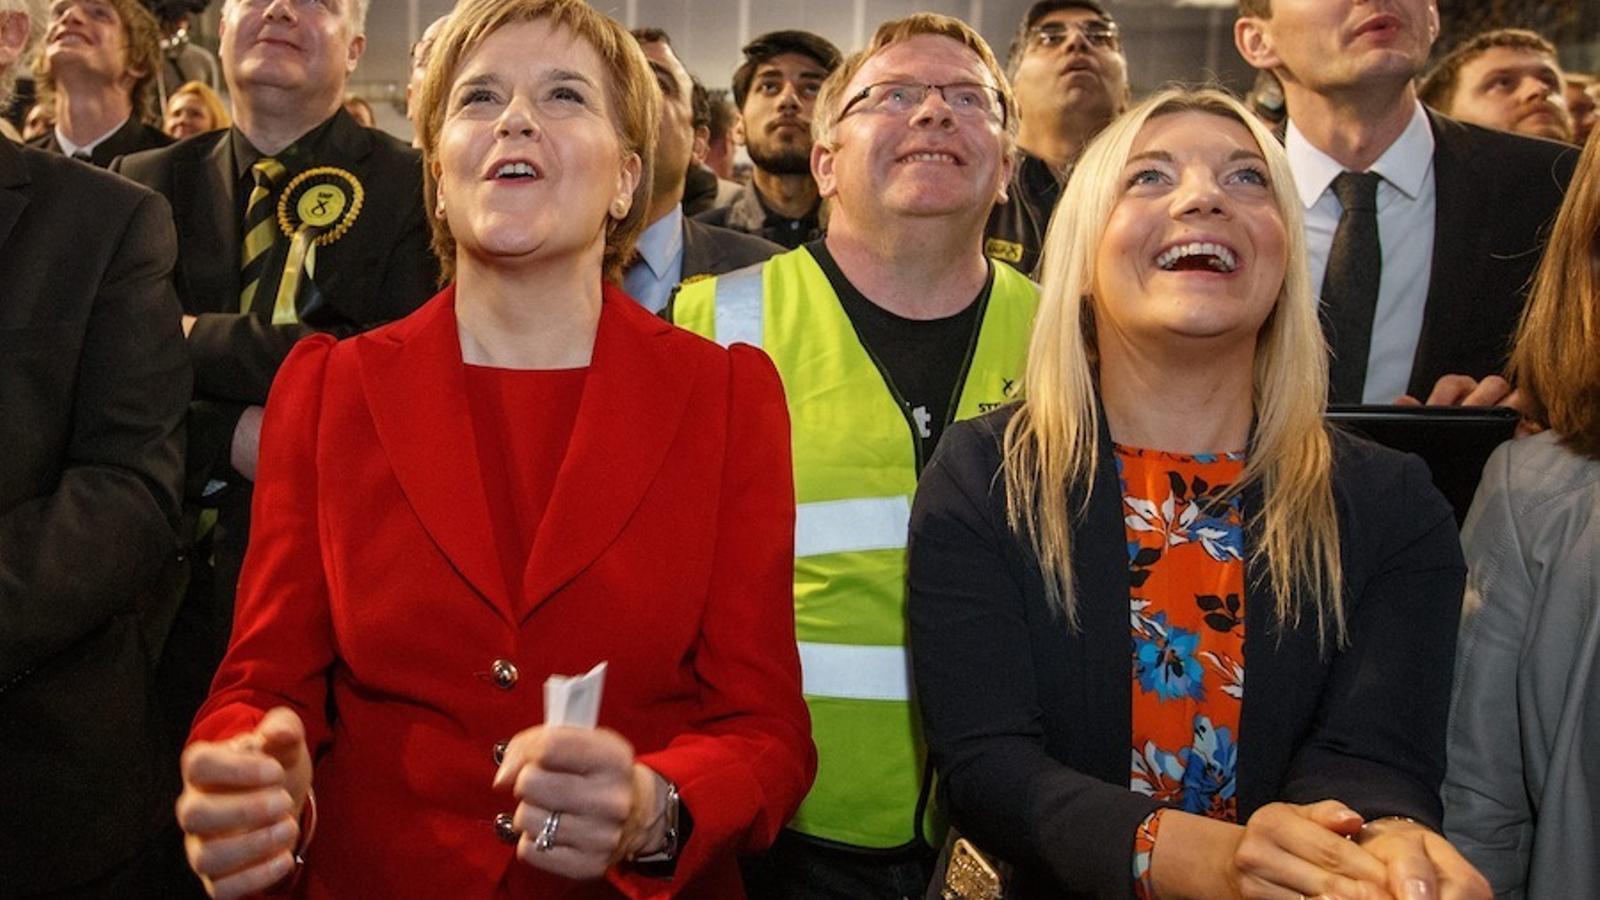 Nicola Sturgeon (de vermell), seguint el recompte des de Glasgow.